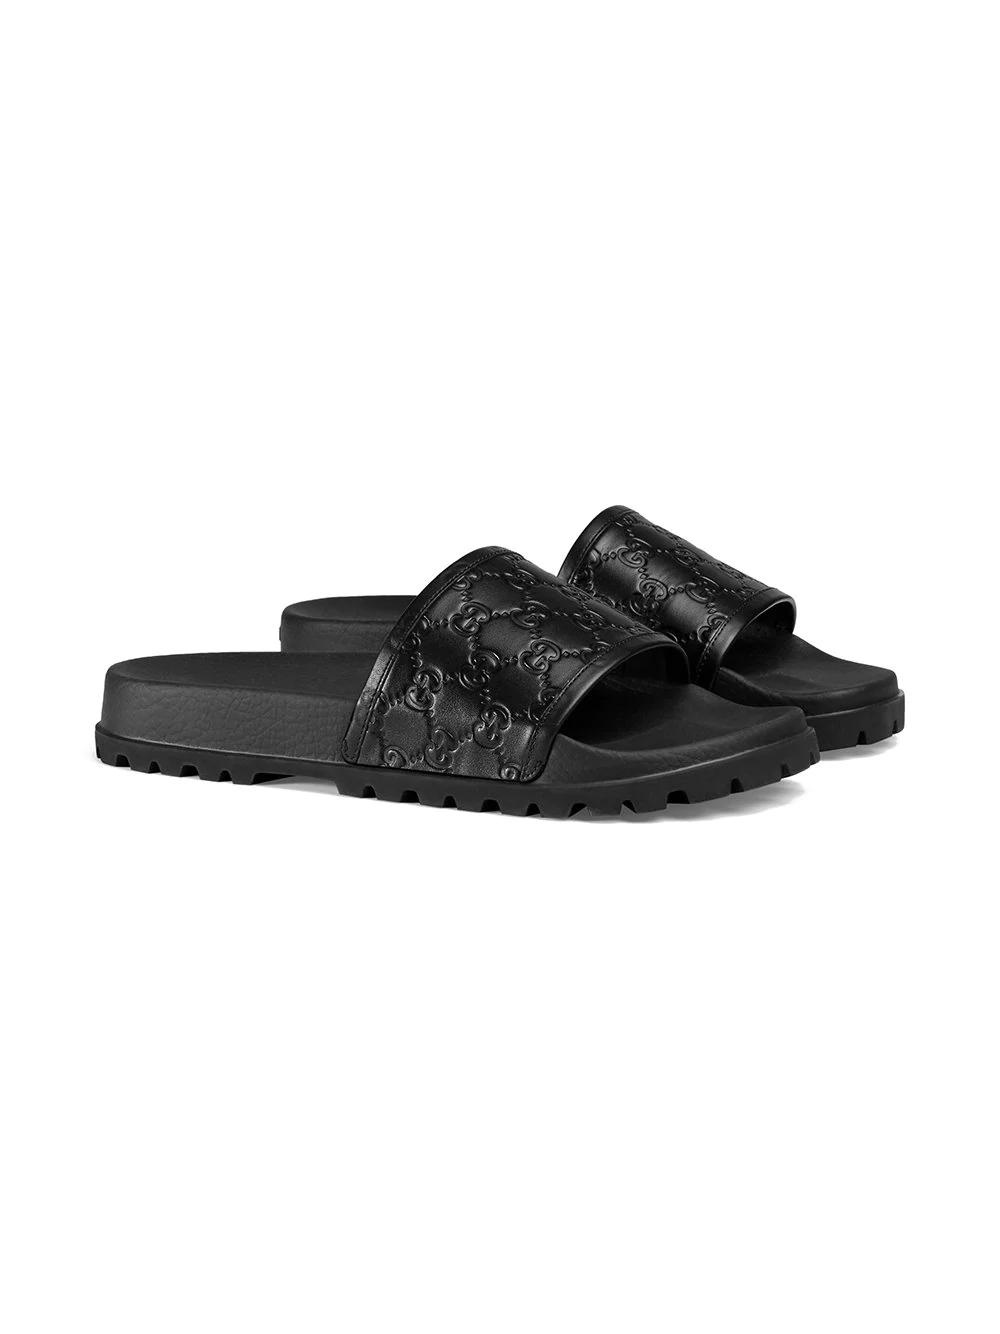 Gucci Pursuit Trek Leather Slider Sandals In 1000 Black